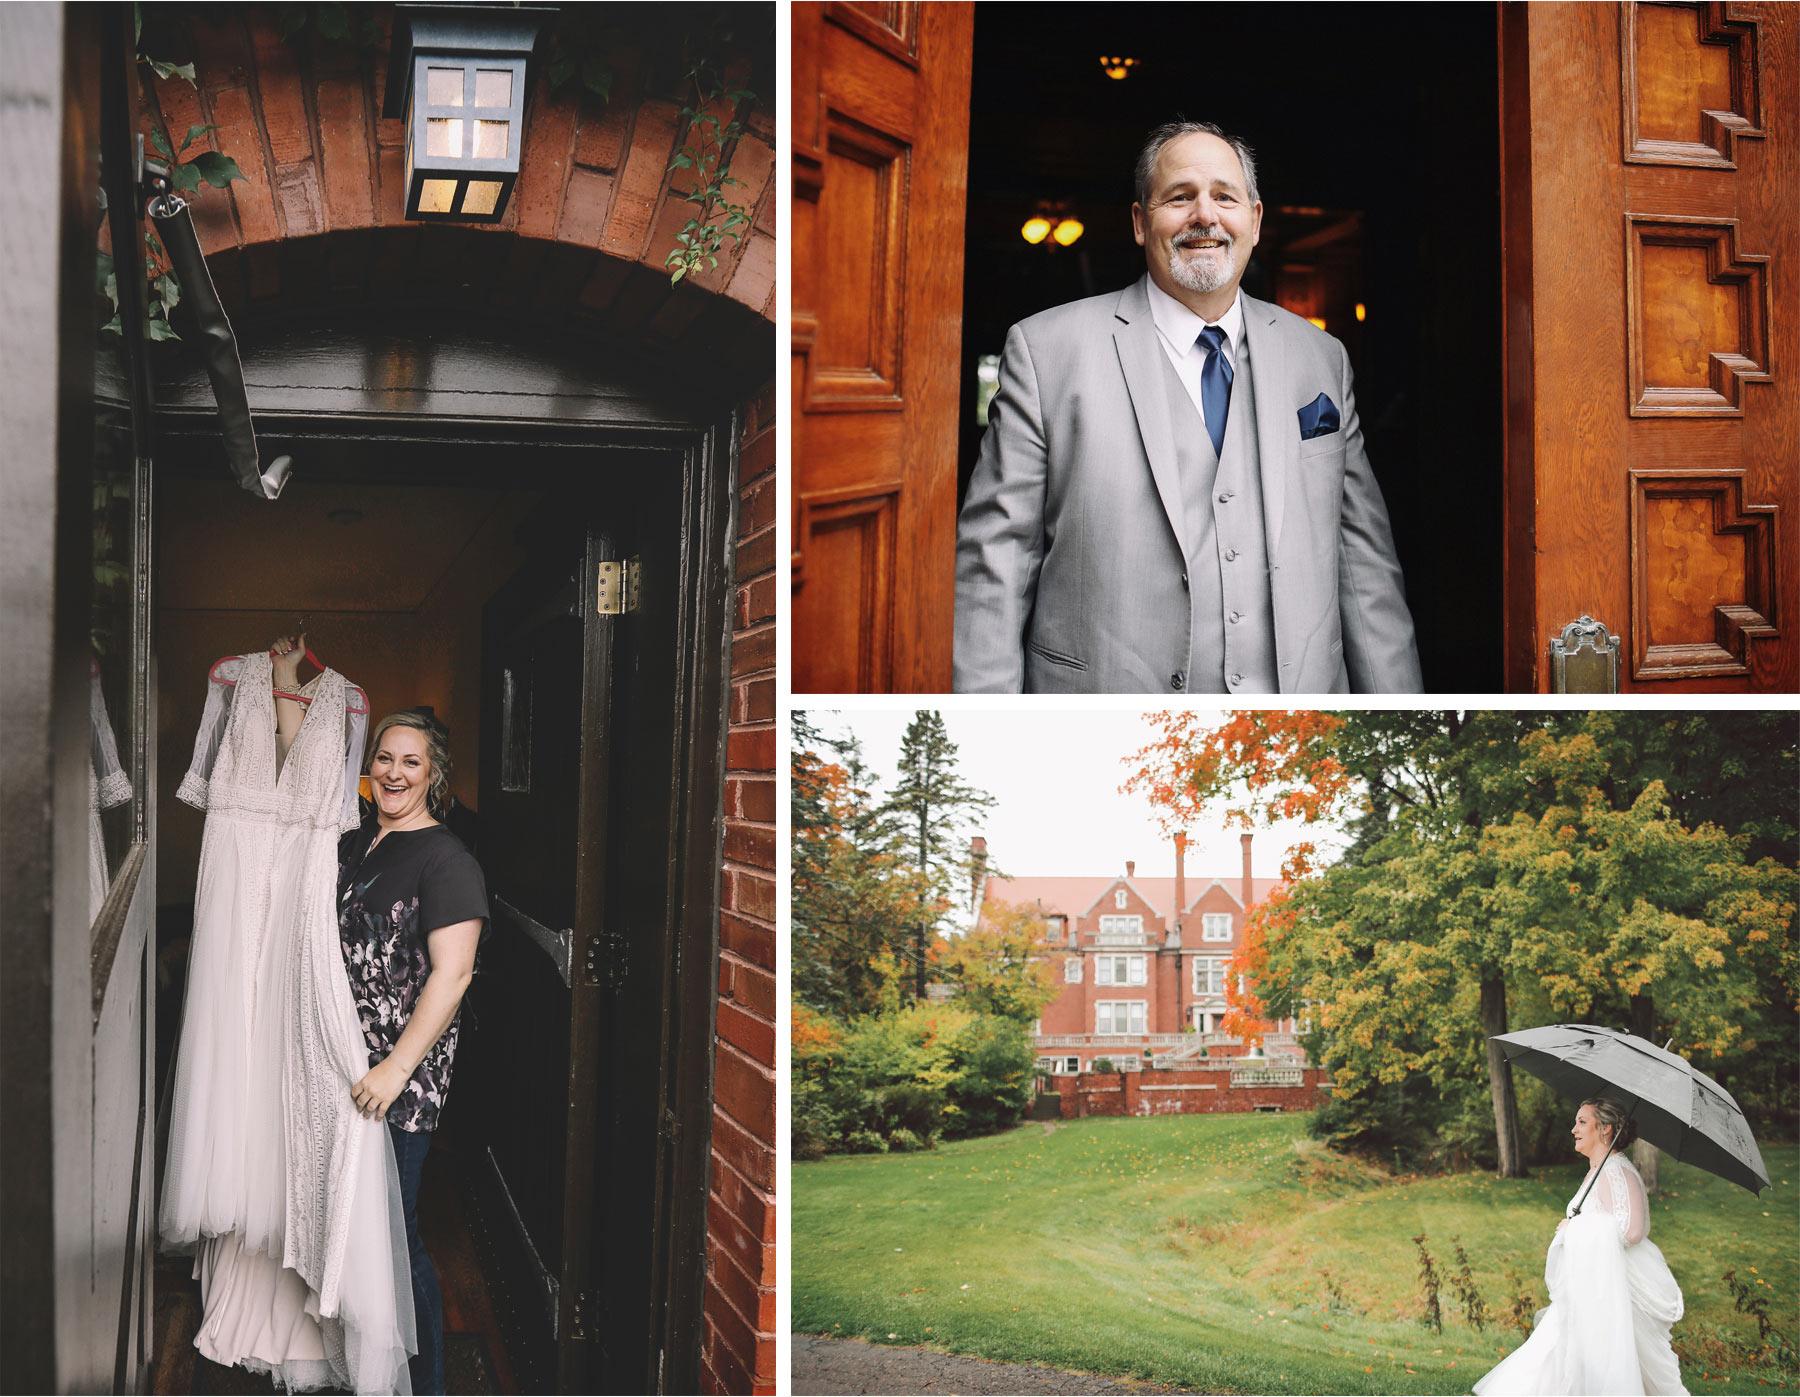 02-Duluth-Minnesota-Wedding-Photography-by-Vick-Photography-Glensheen-Mansion-Rain-Umbrella-Dress-Kelli-and-Marc.jpg